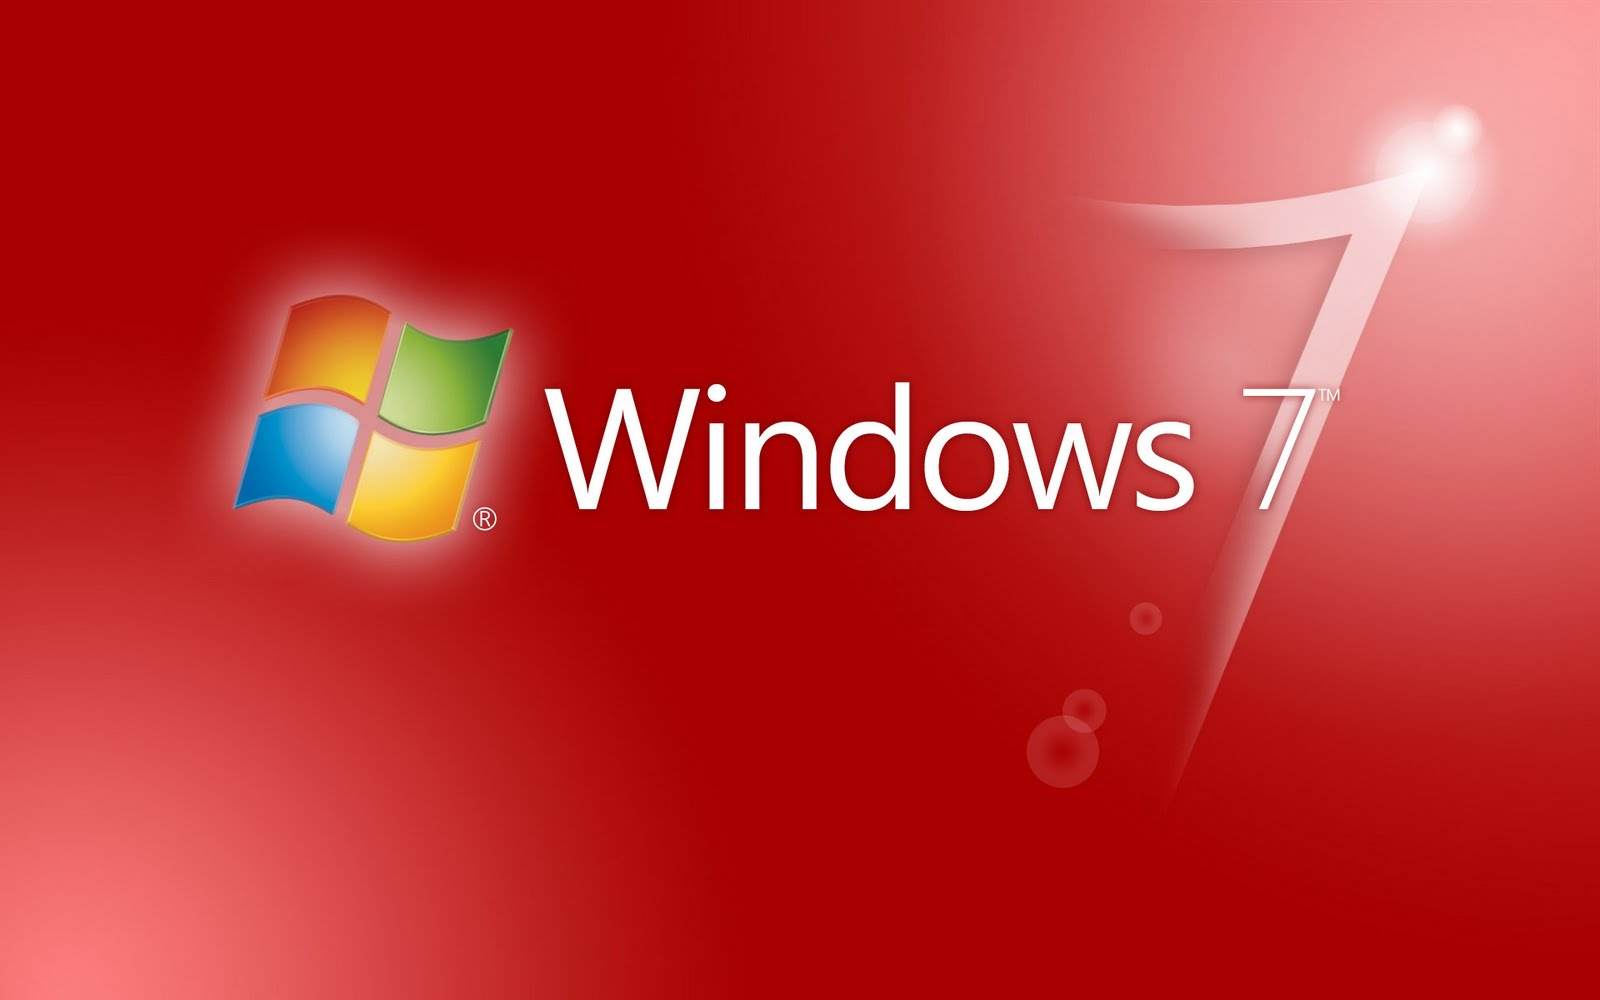 http://1.bp.blogspot.com/-dBlD_Rc2RNU/TfVnSri8tuI/AAAAAAAAHsY/eE-97QFWgV8/s1600/Windows+7+Wallpaper+HQ.jpg